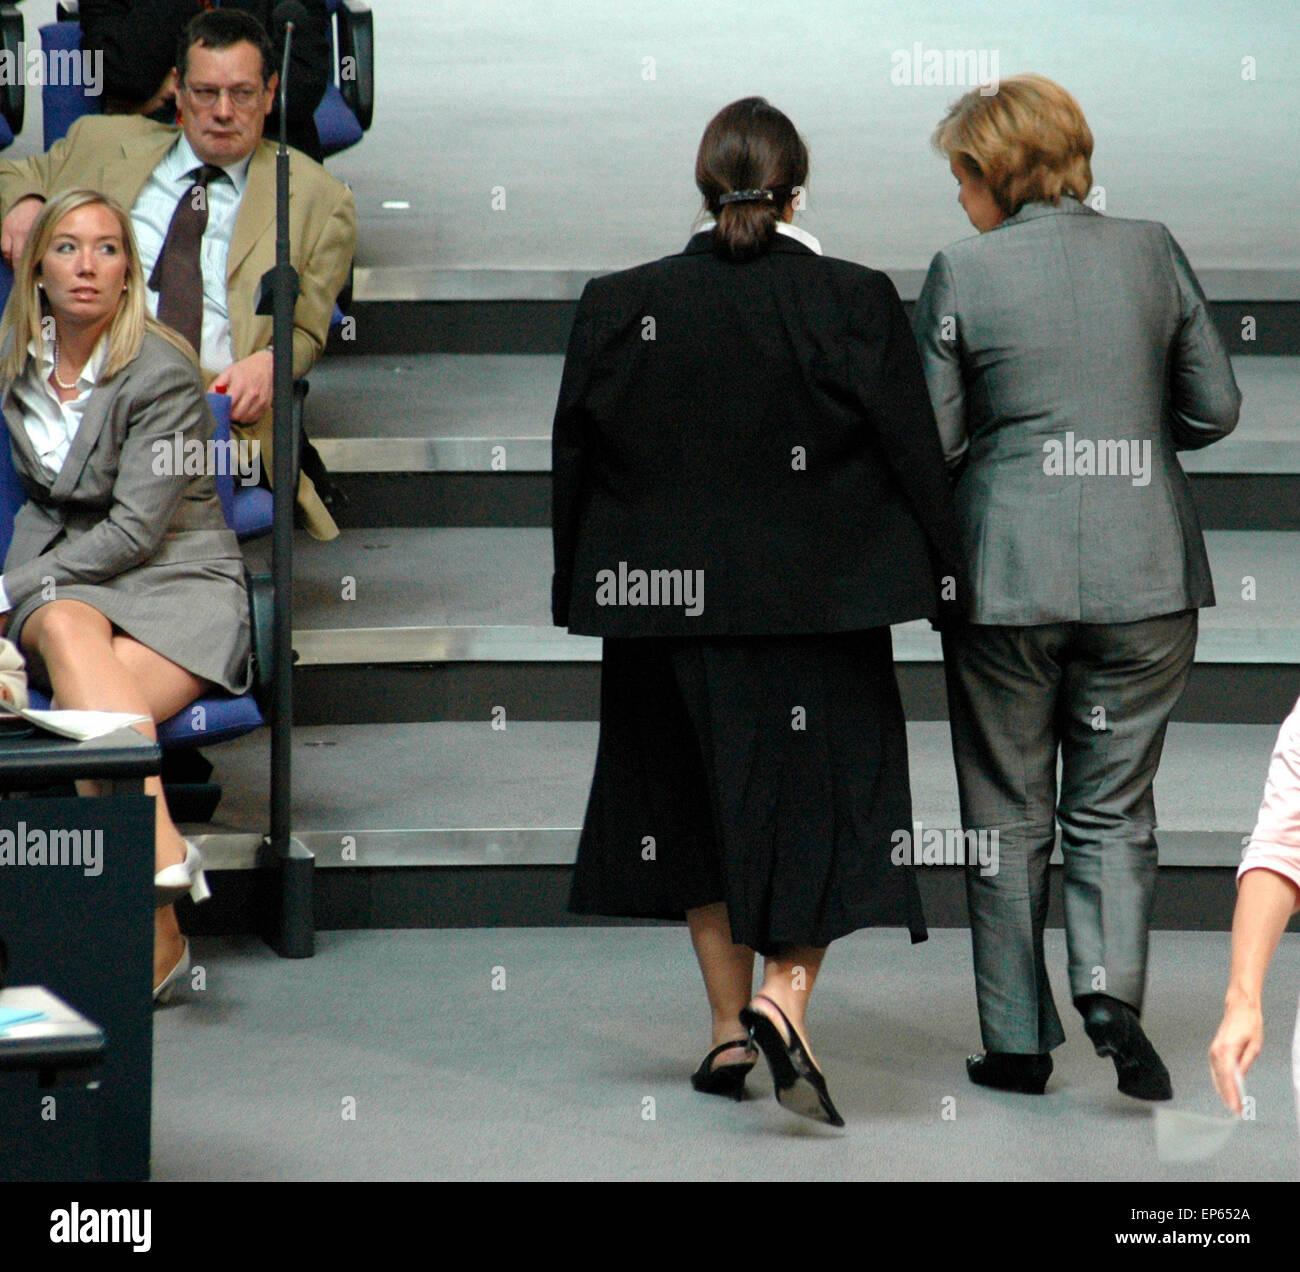 Angela Merkel Bundeskanzlerin u.a. - Session im Bundestag am 29. Juni 2006, Reichstagsgebaeude, Berlin-Tiergarten. Banque D'Images